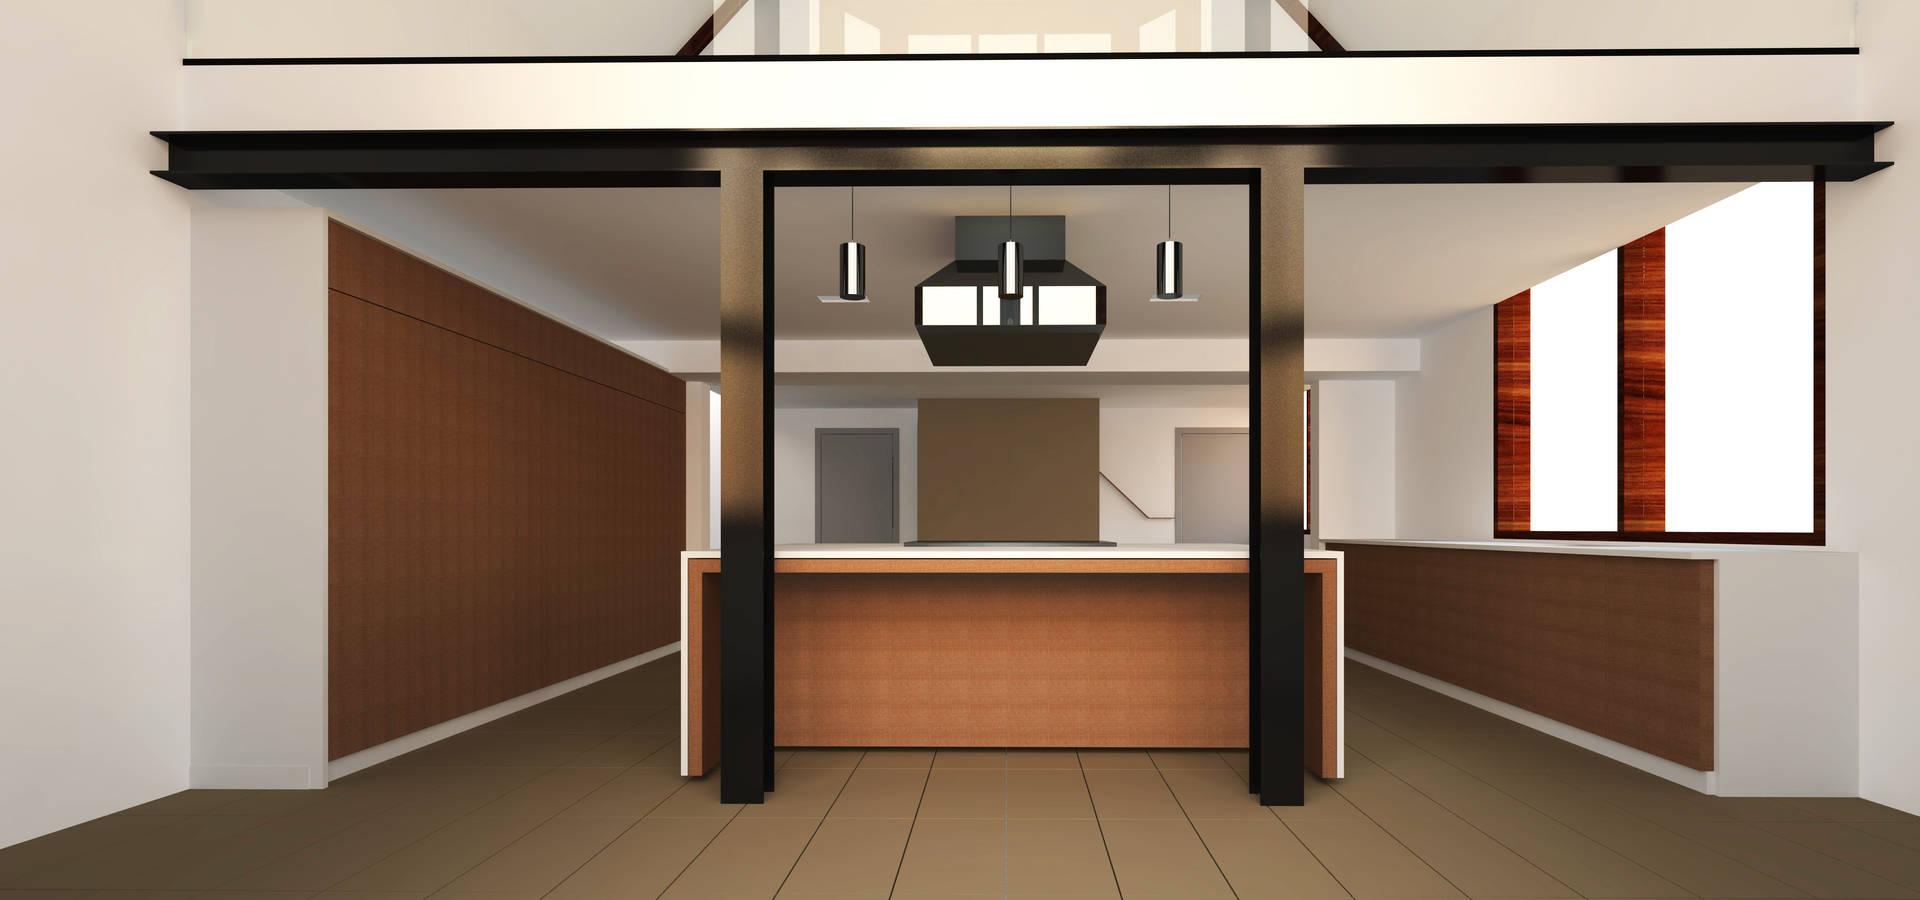 Vita Architecture Ltd